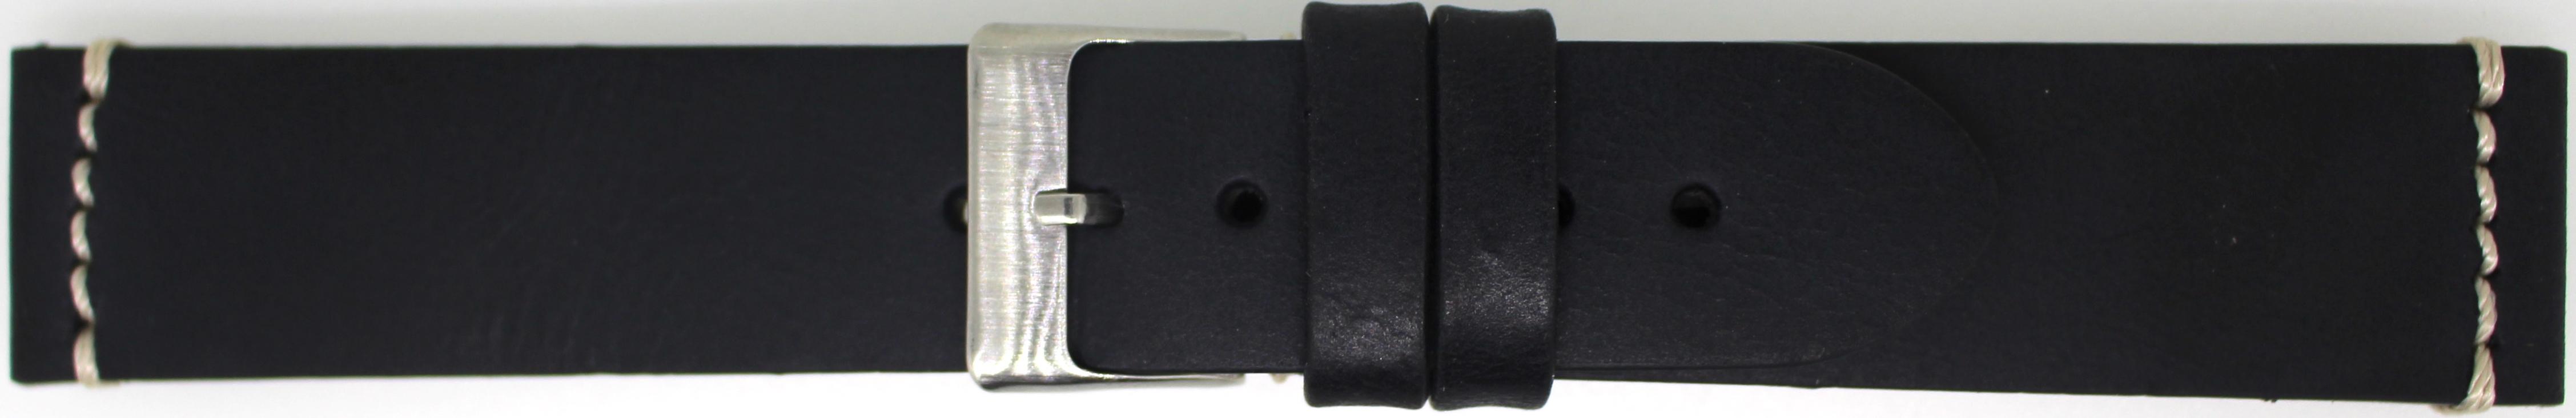 Horlogeband 845.01.20 Leder Zwart 20mm + wit stiksel